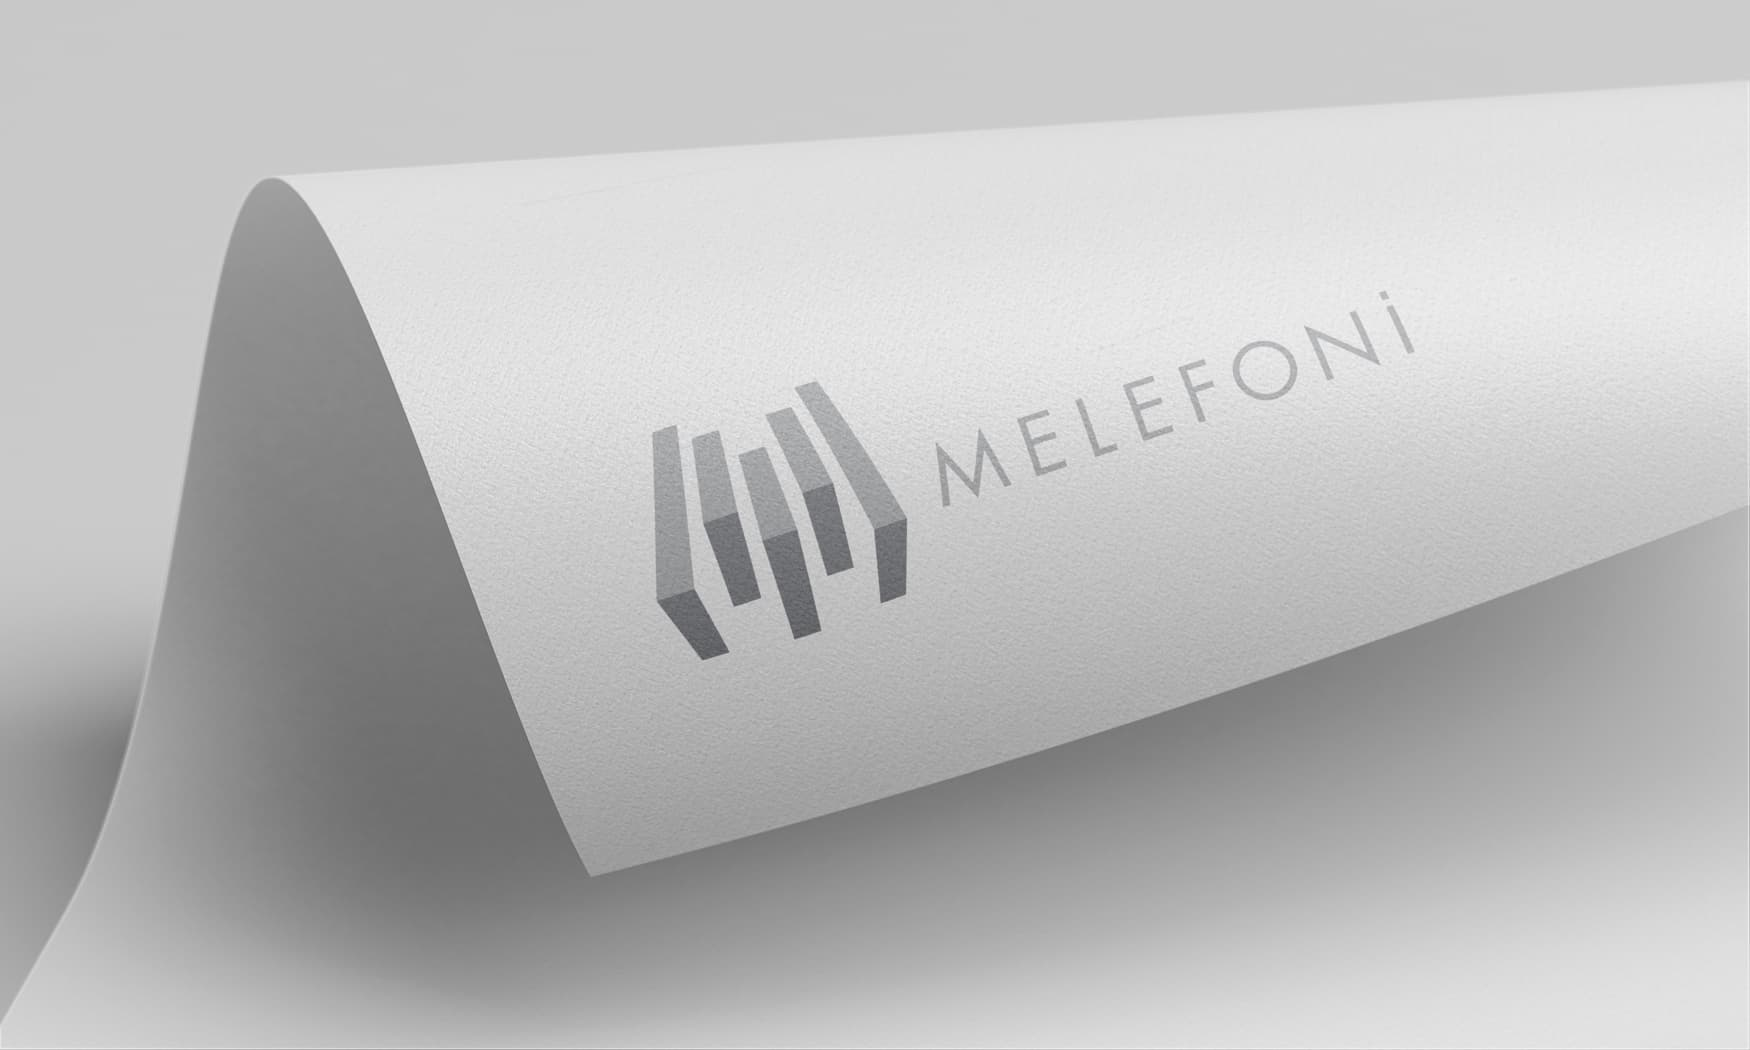 logo-on-paper-low